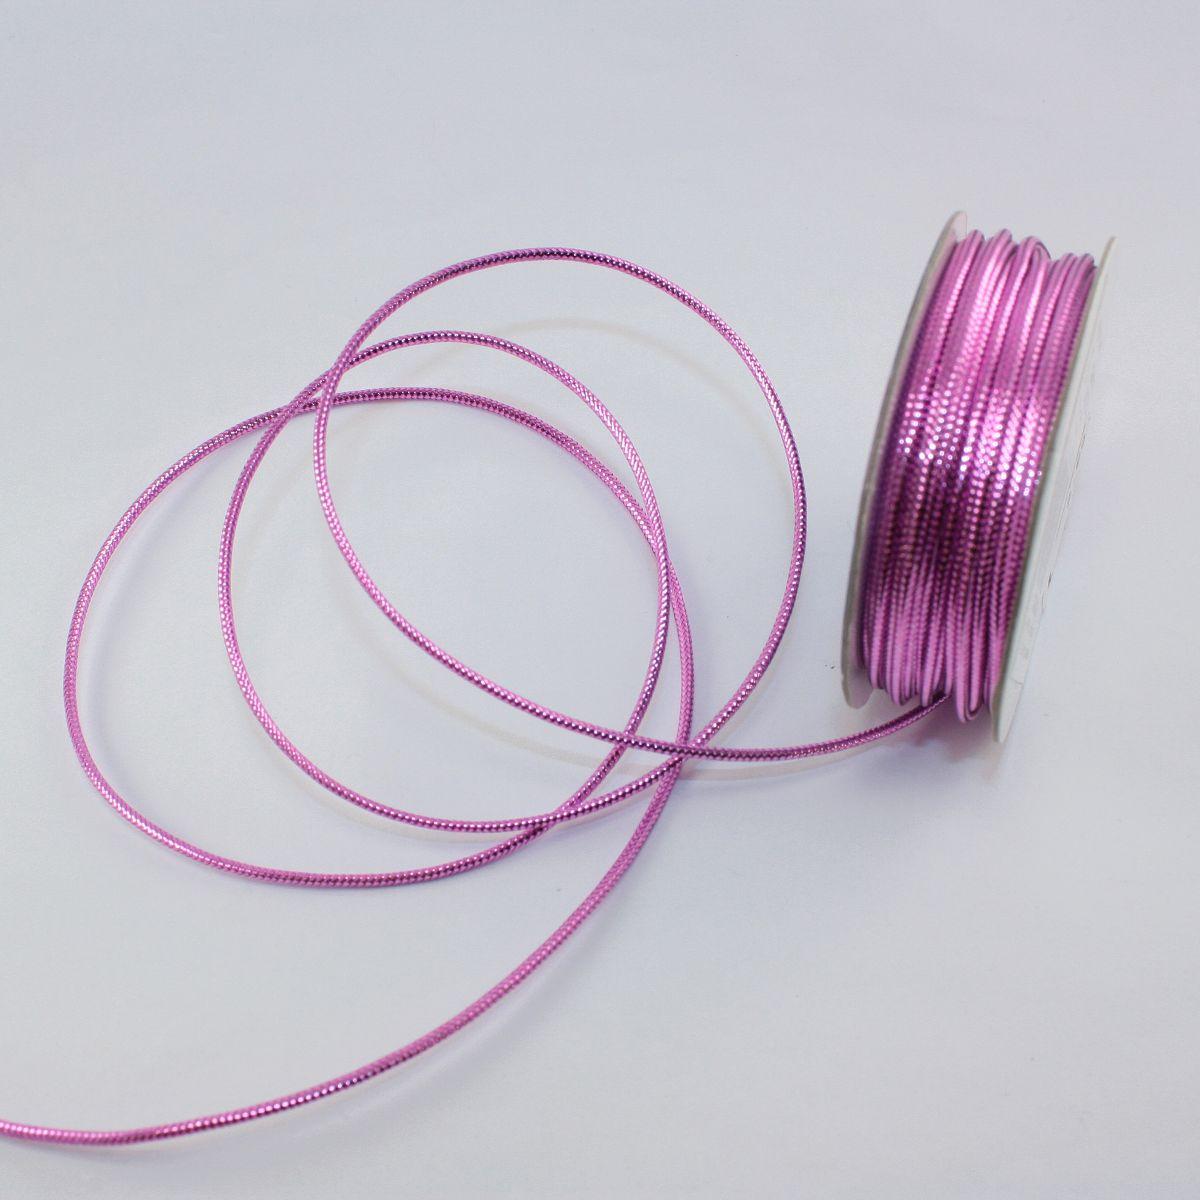 Cordelette en bobine rose foncé 1.6 mm